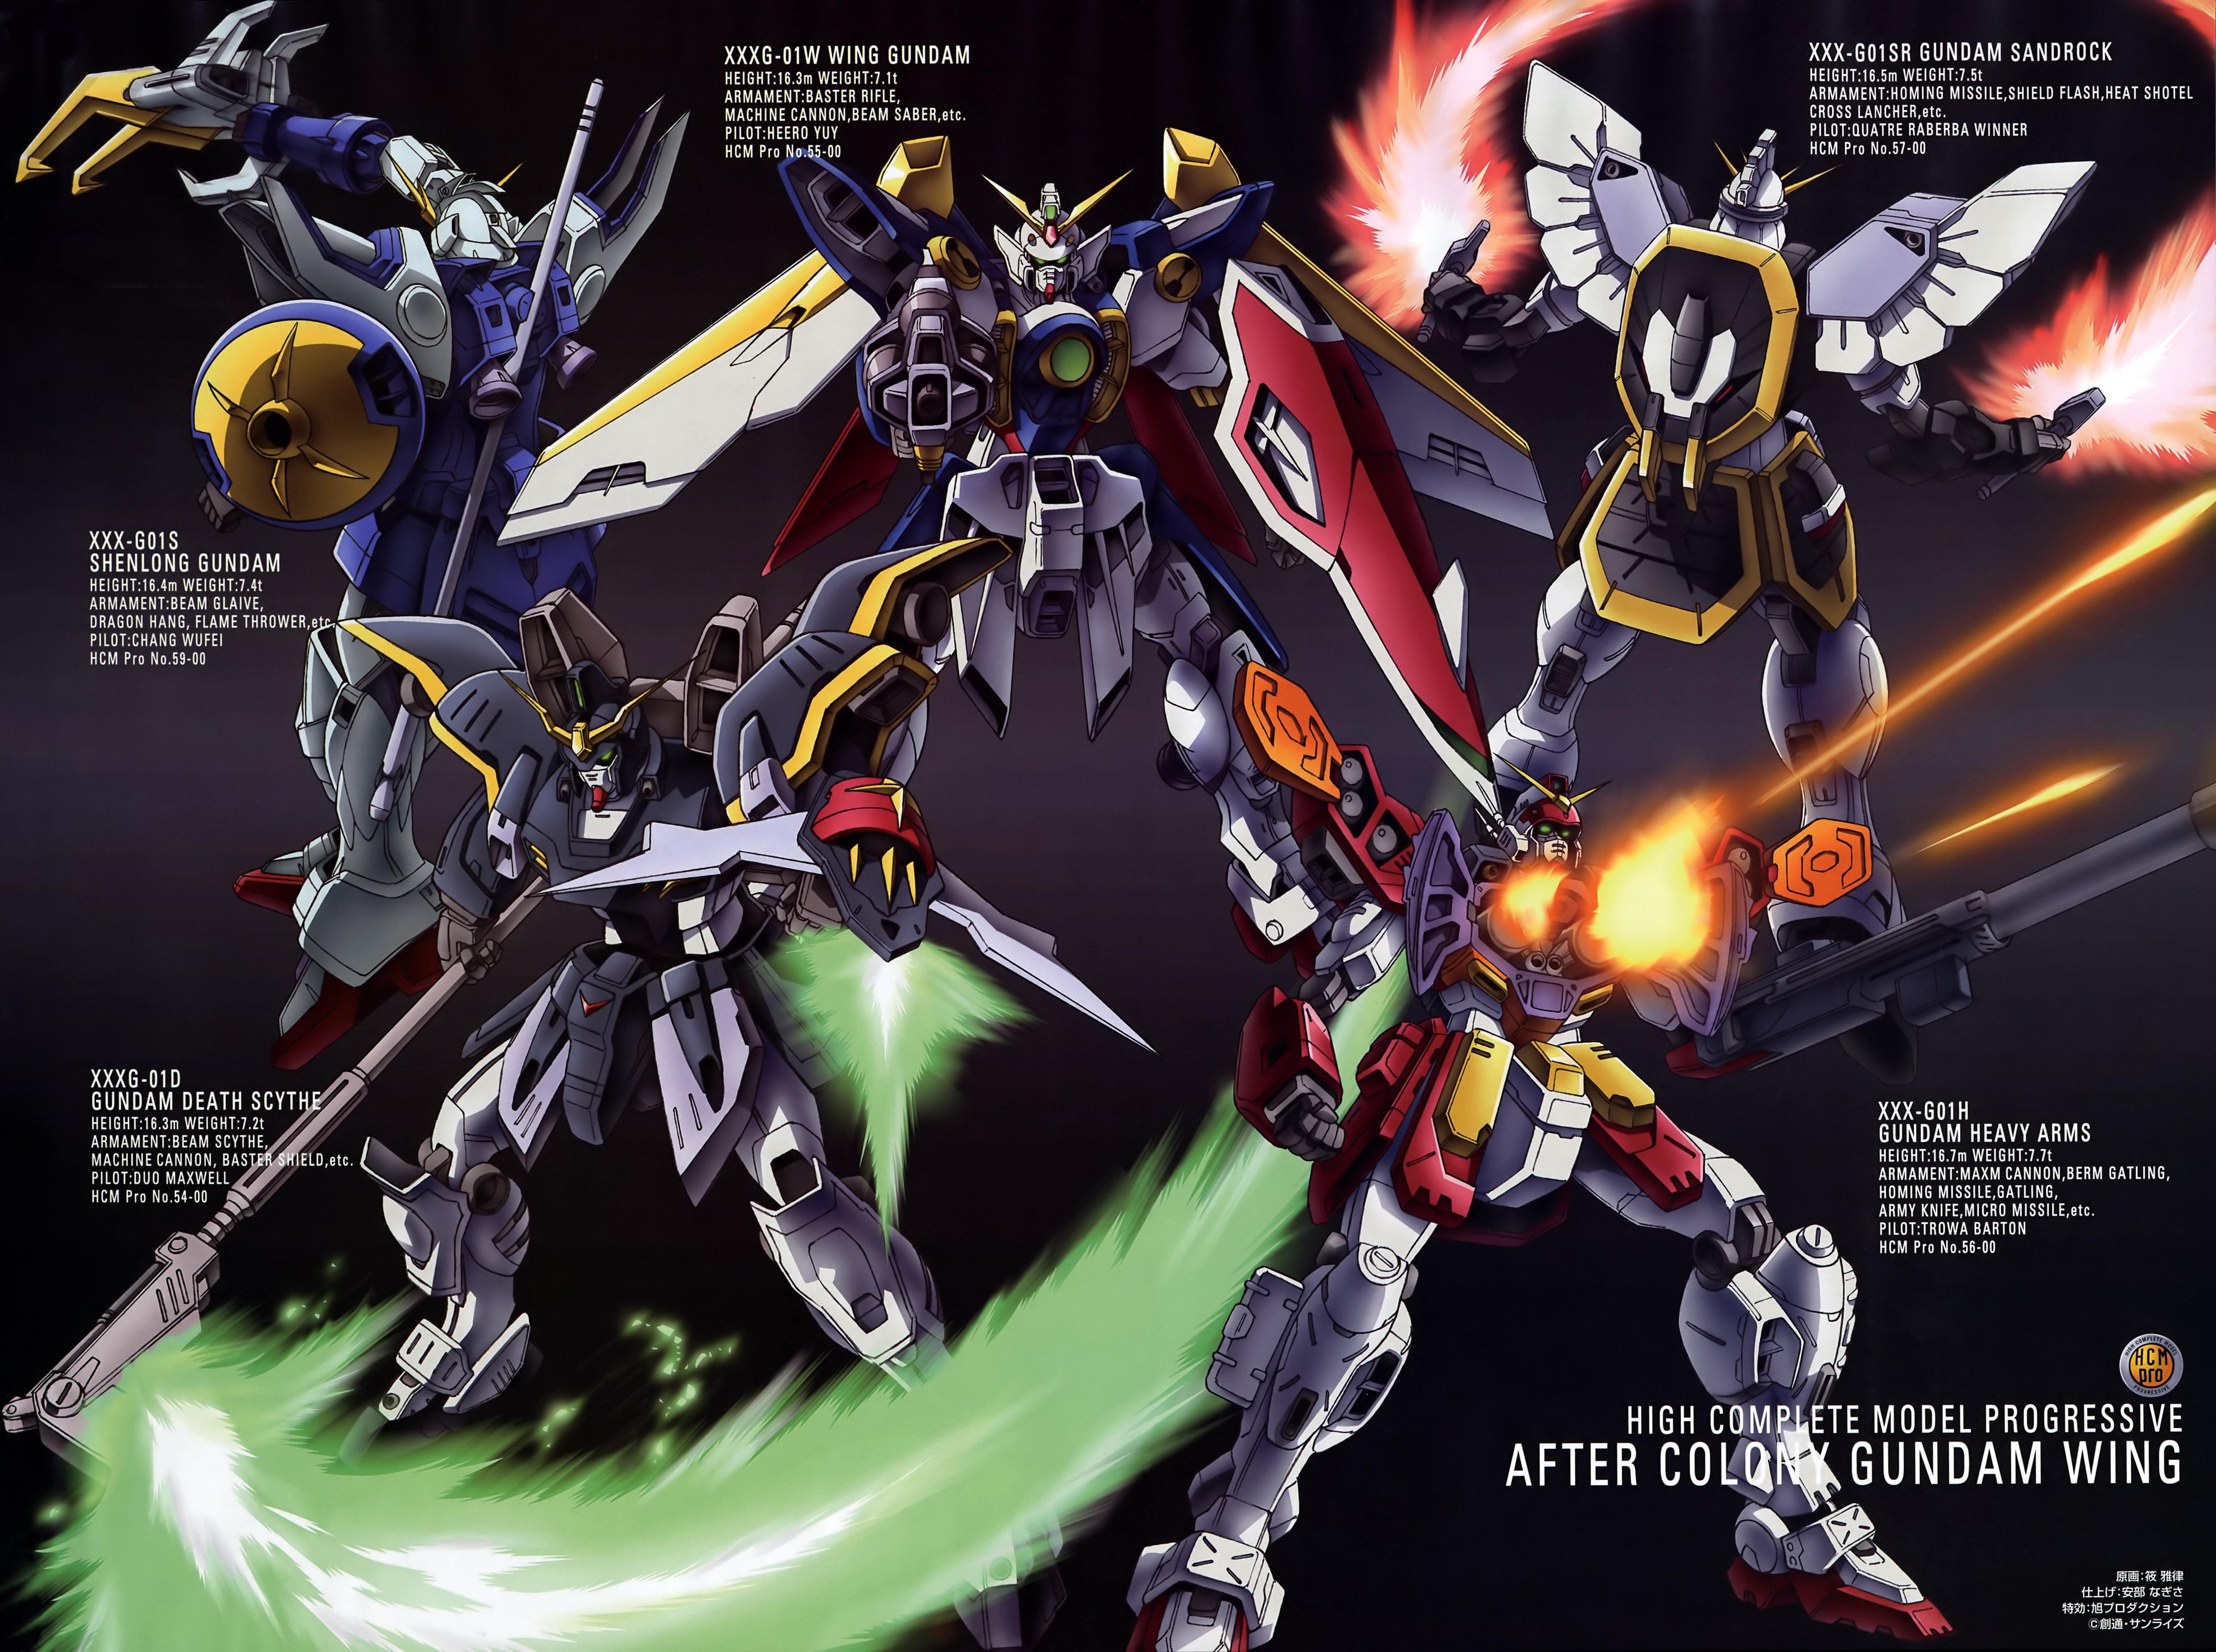 Mobile Suit Gundam Images Crazy Gallery 5301x3953